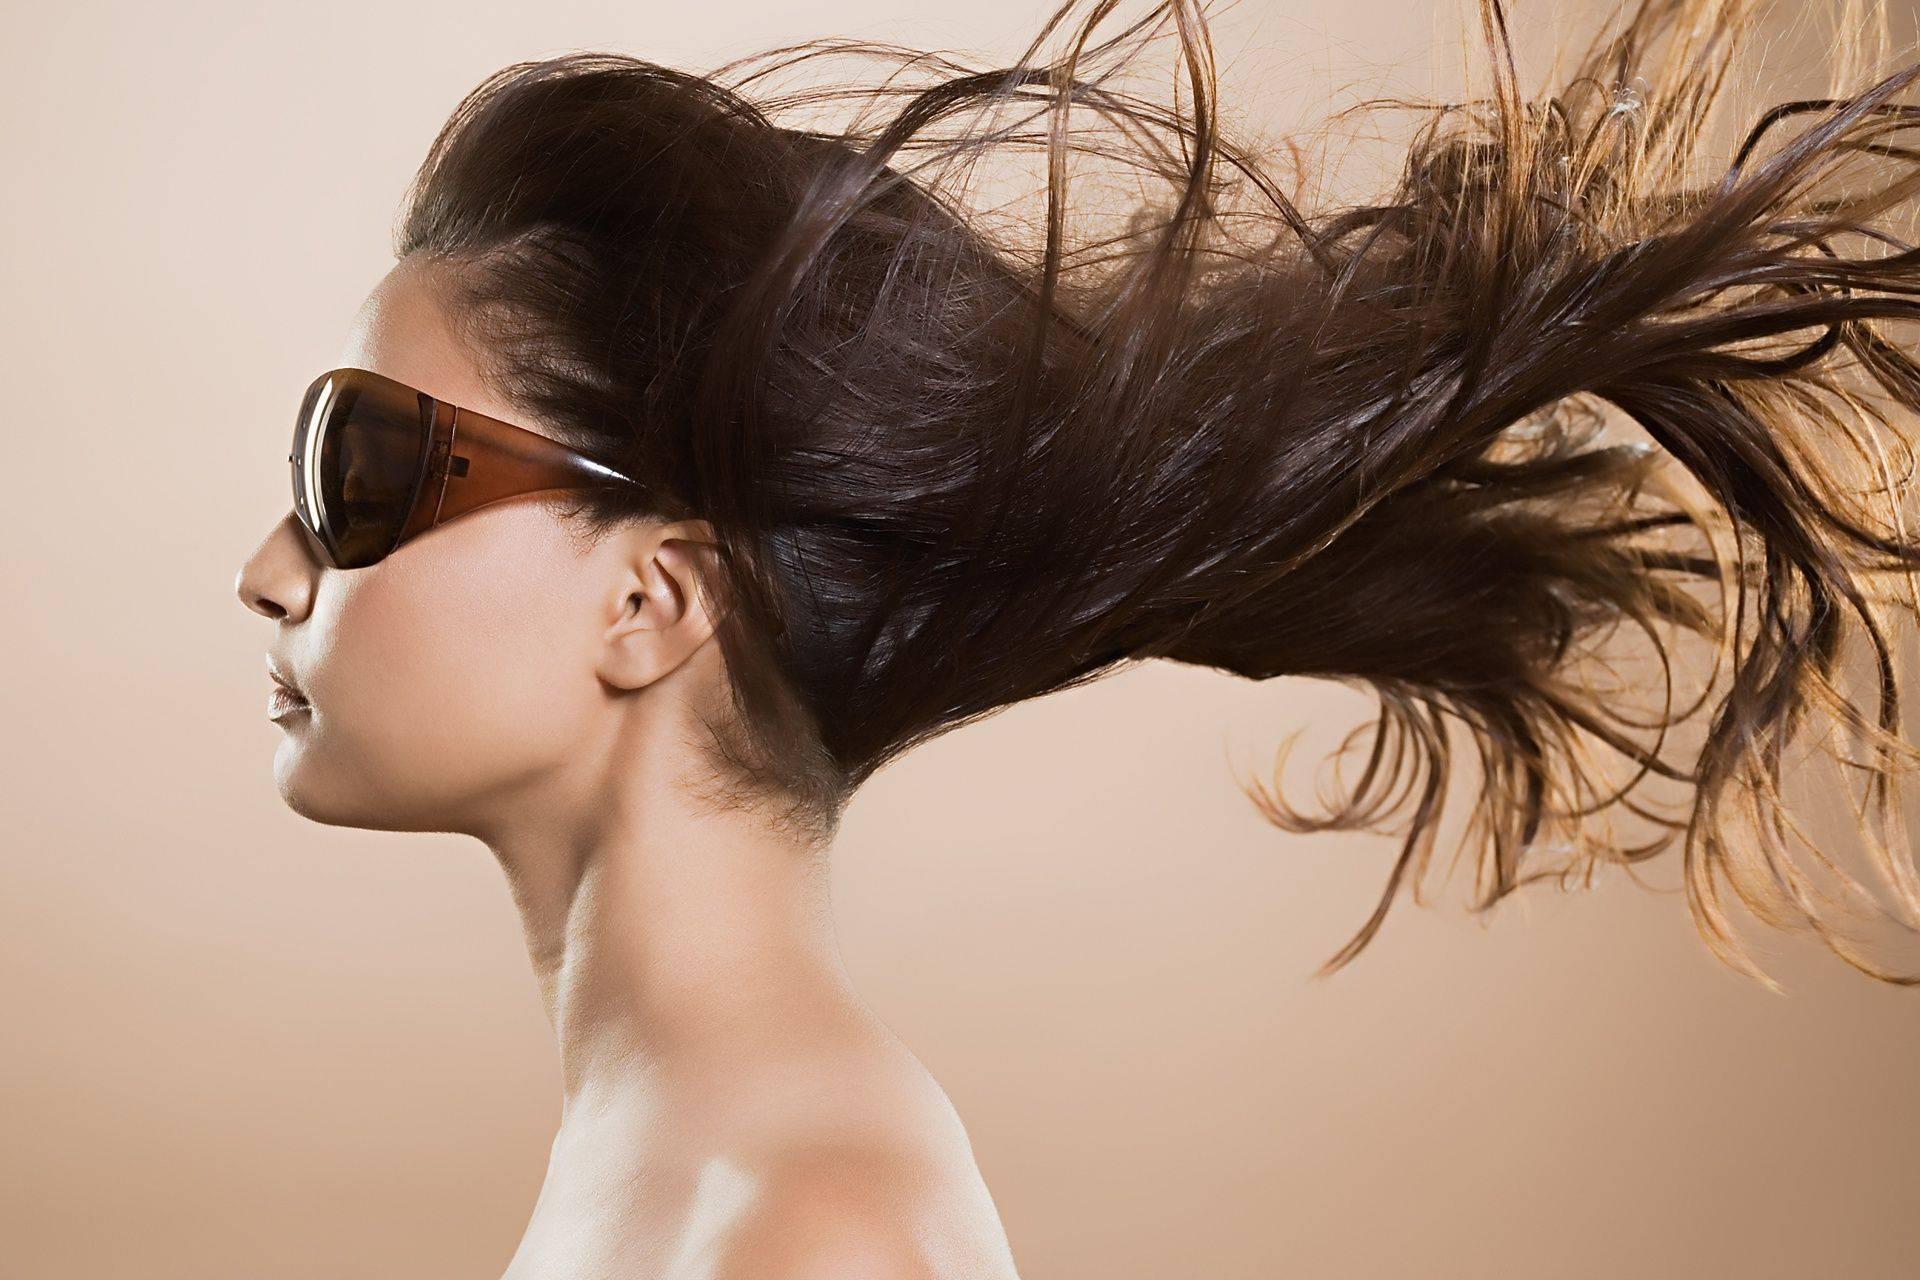 Hair styling, hair coloring, hair cutting on Hilton head Island,SC